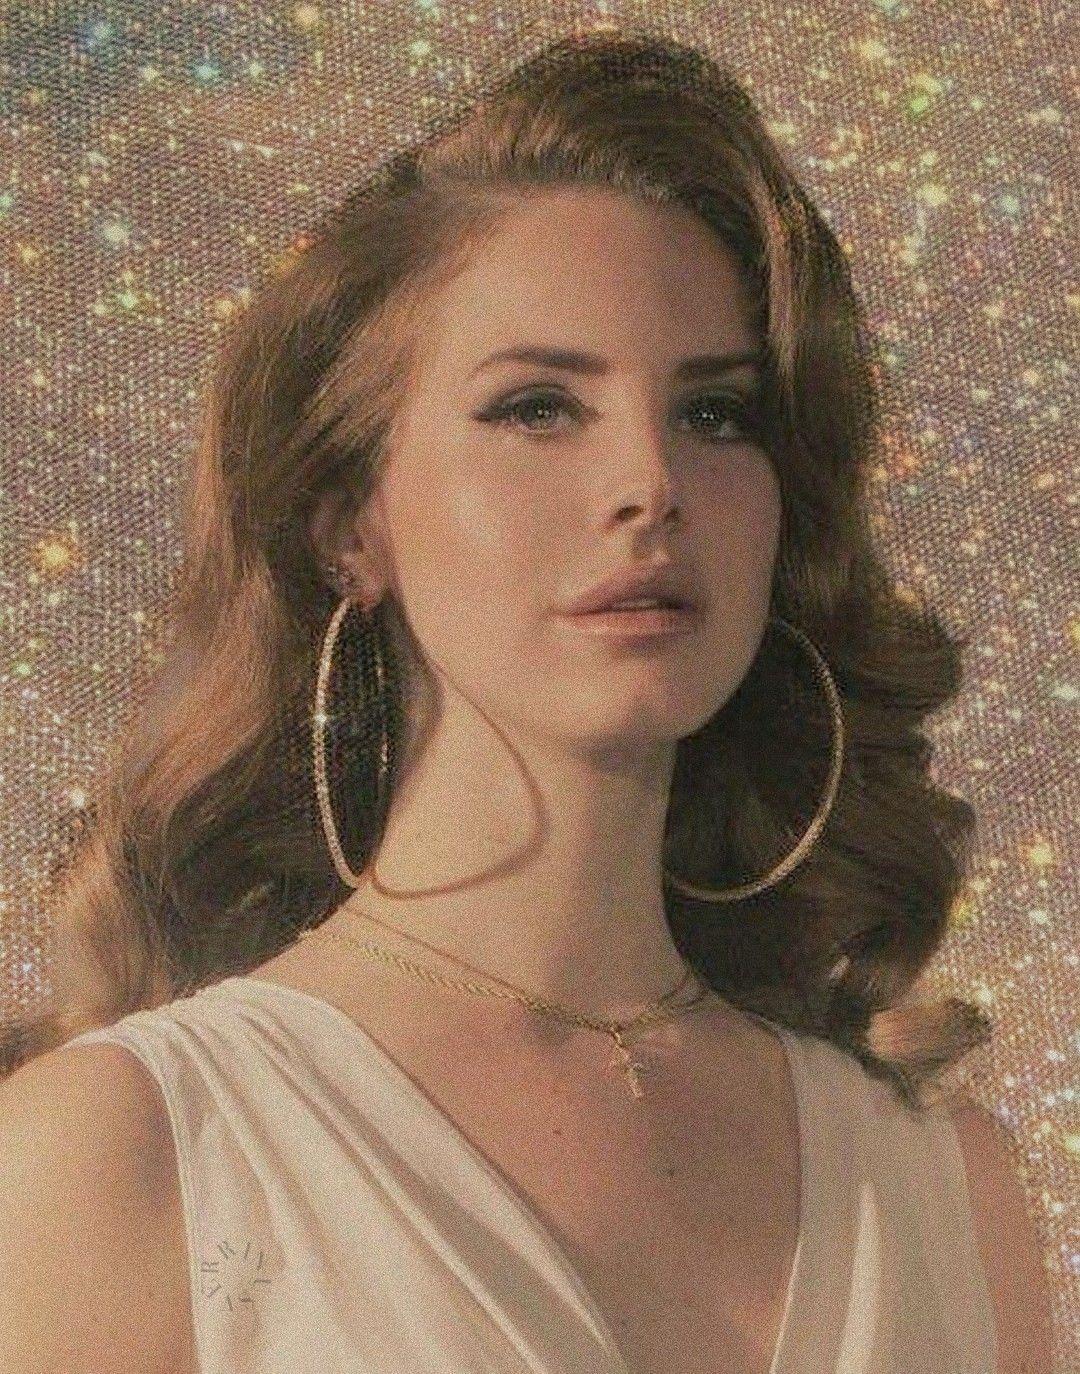 Lana Del Rey Aesthetic Pictures